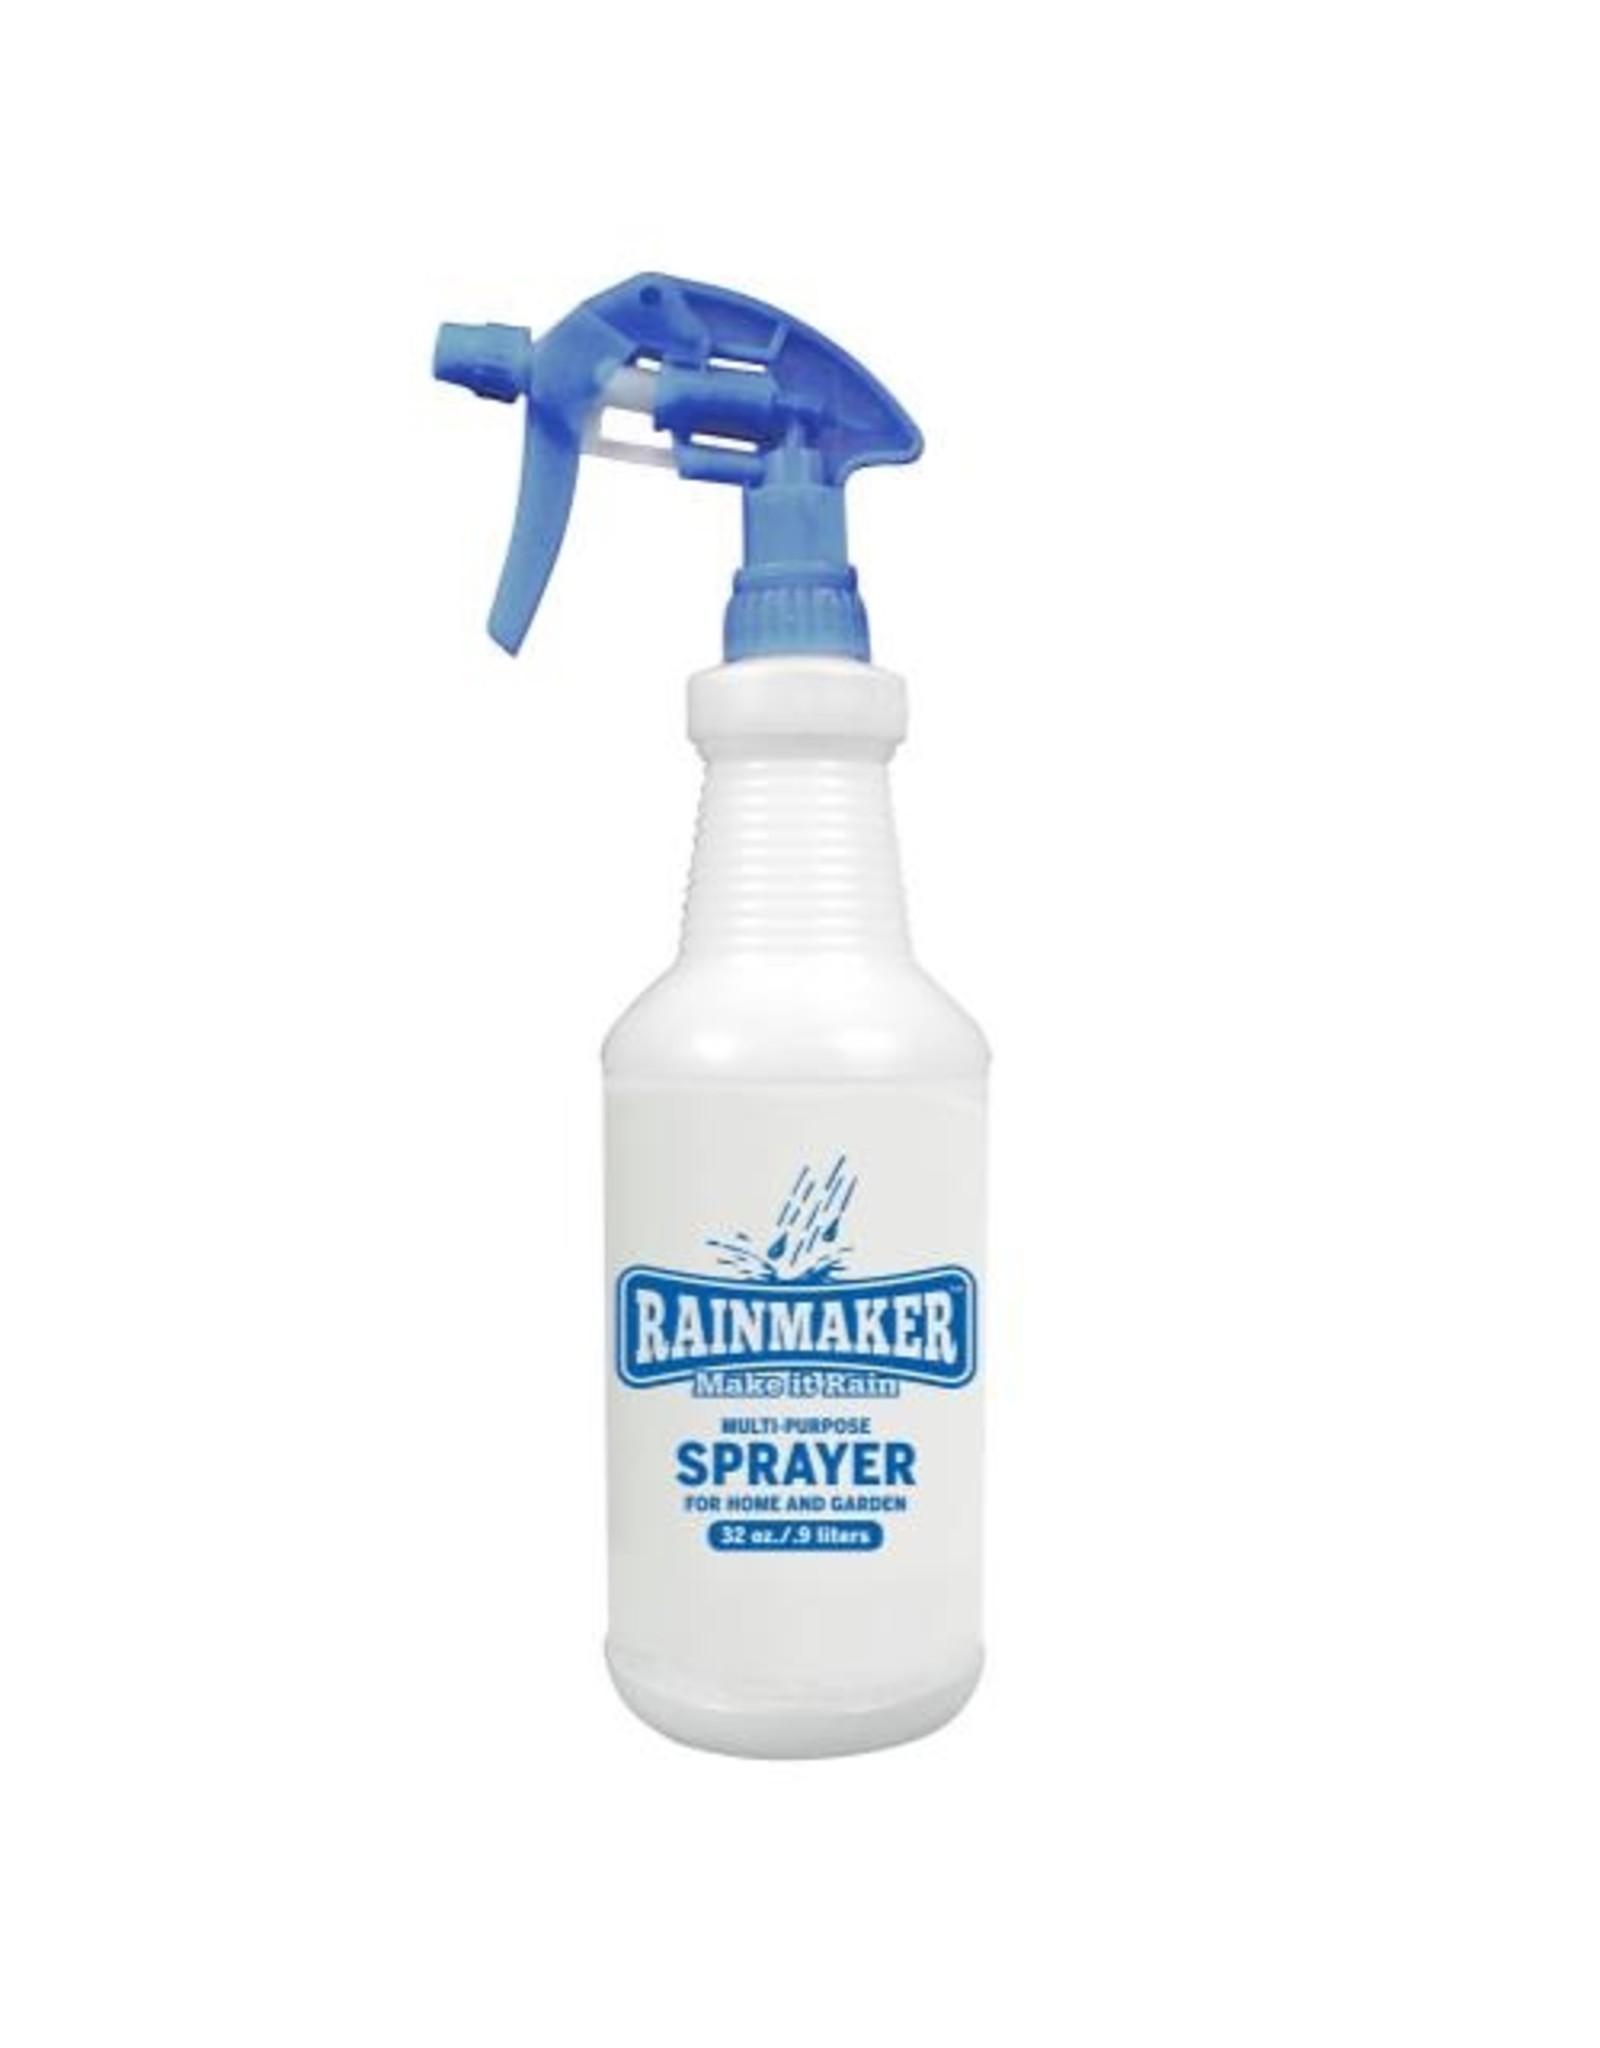 Rainmaker Hand Sprayer